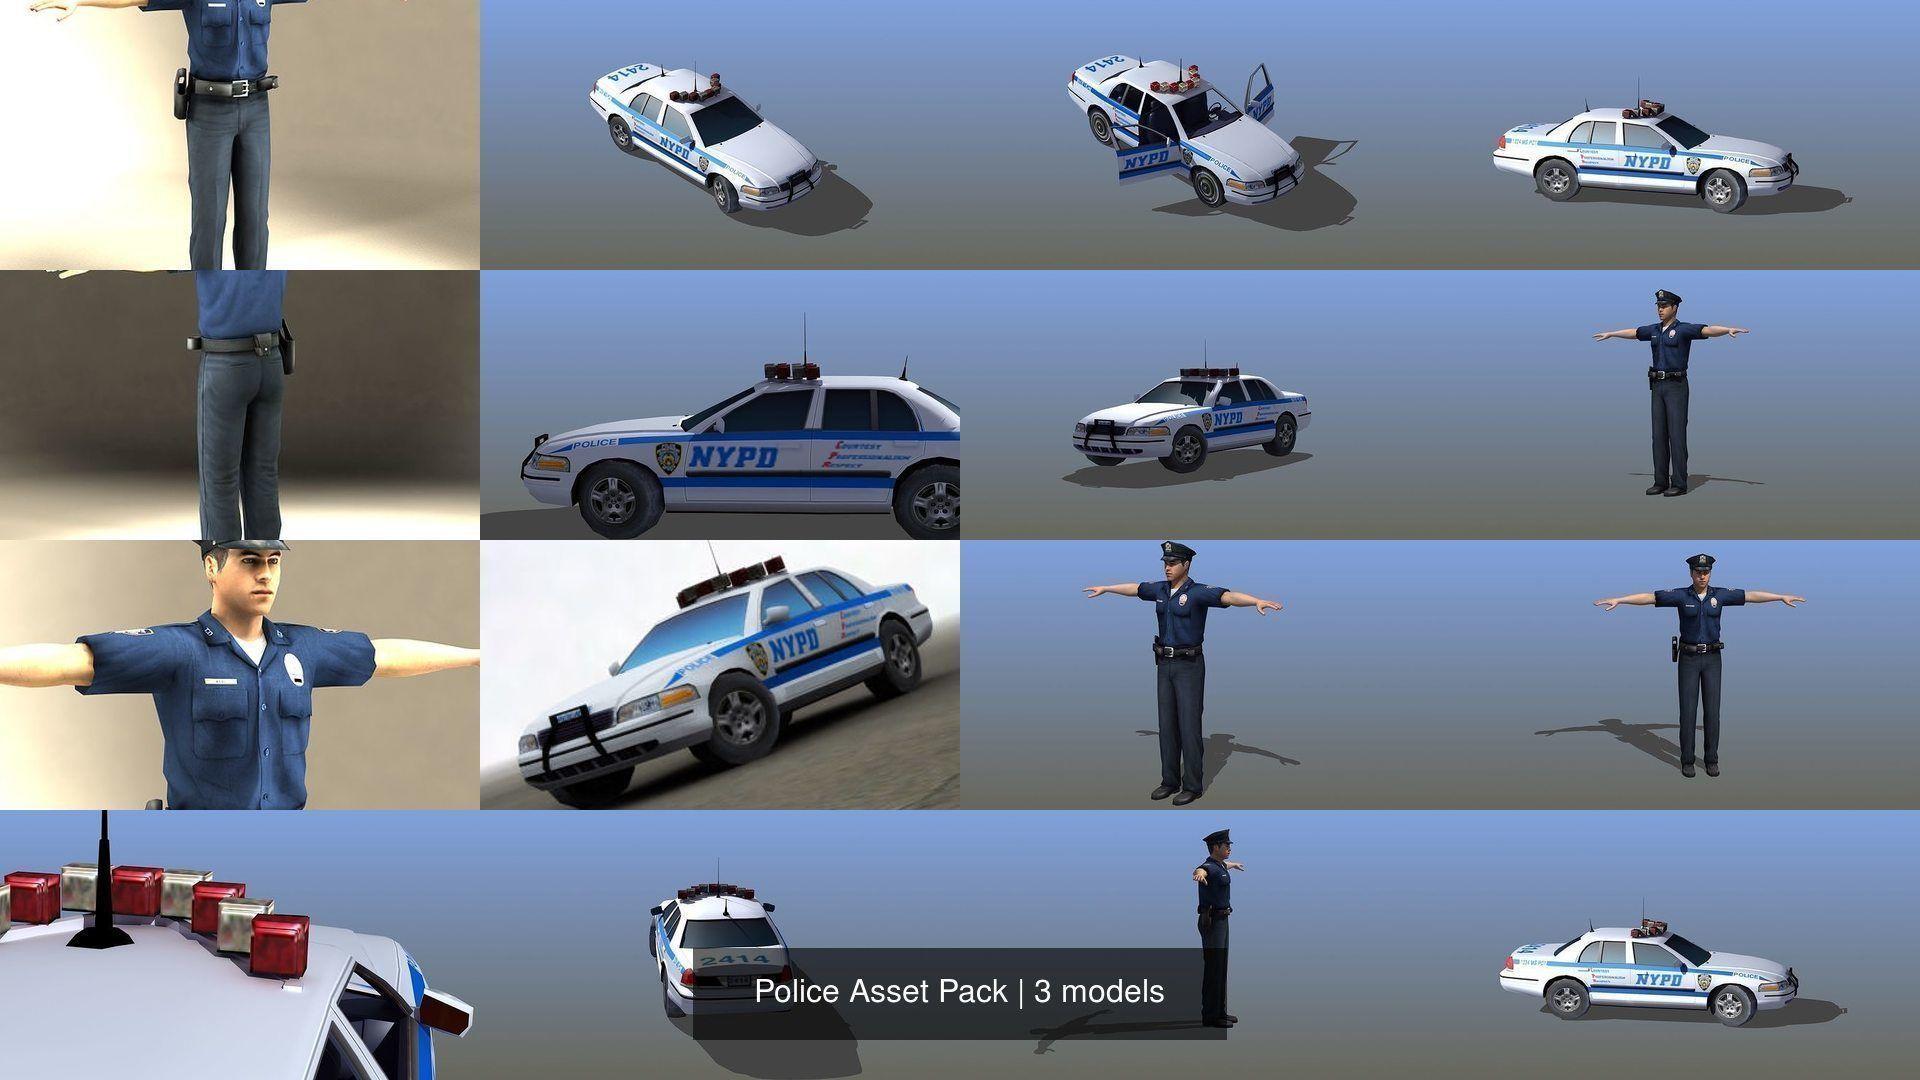 Police Asset Pack